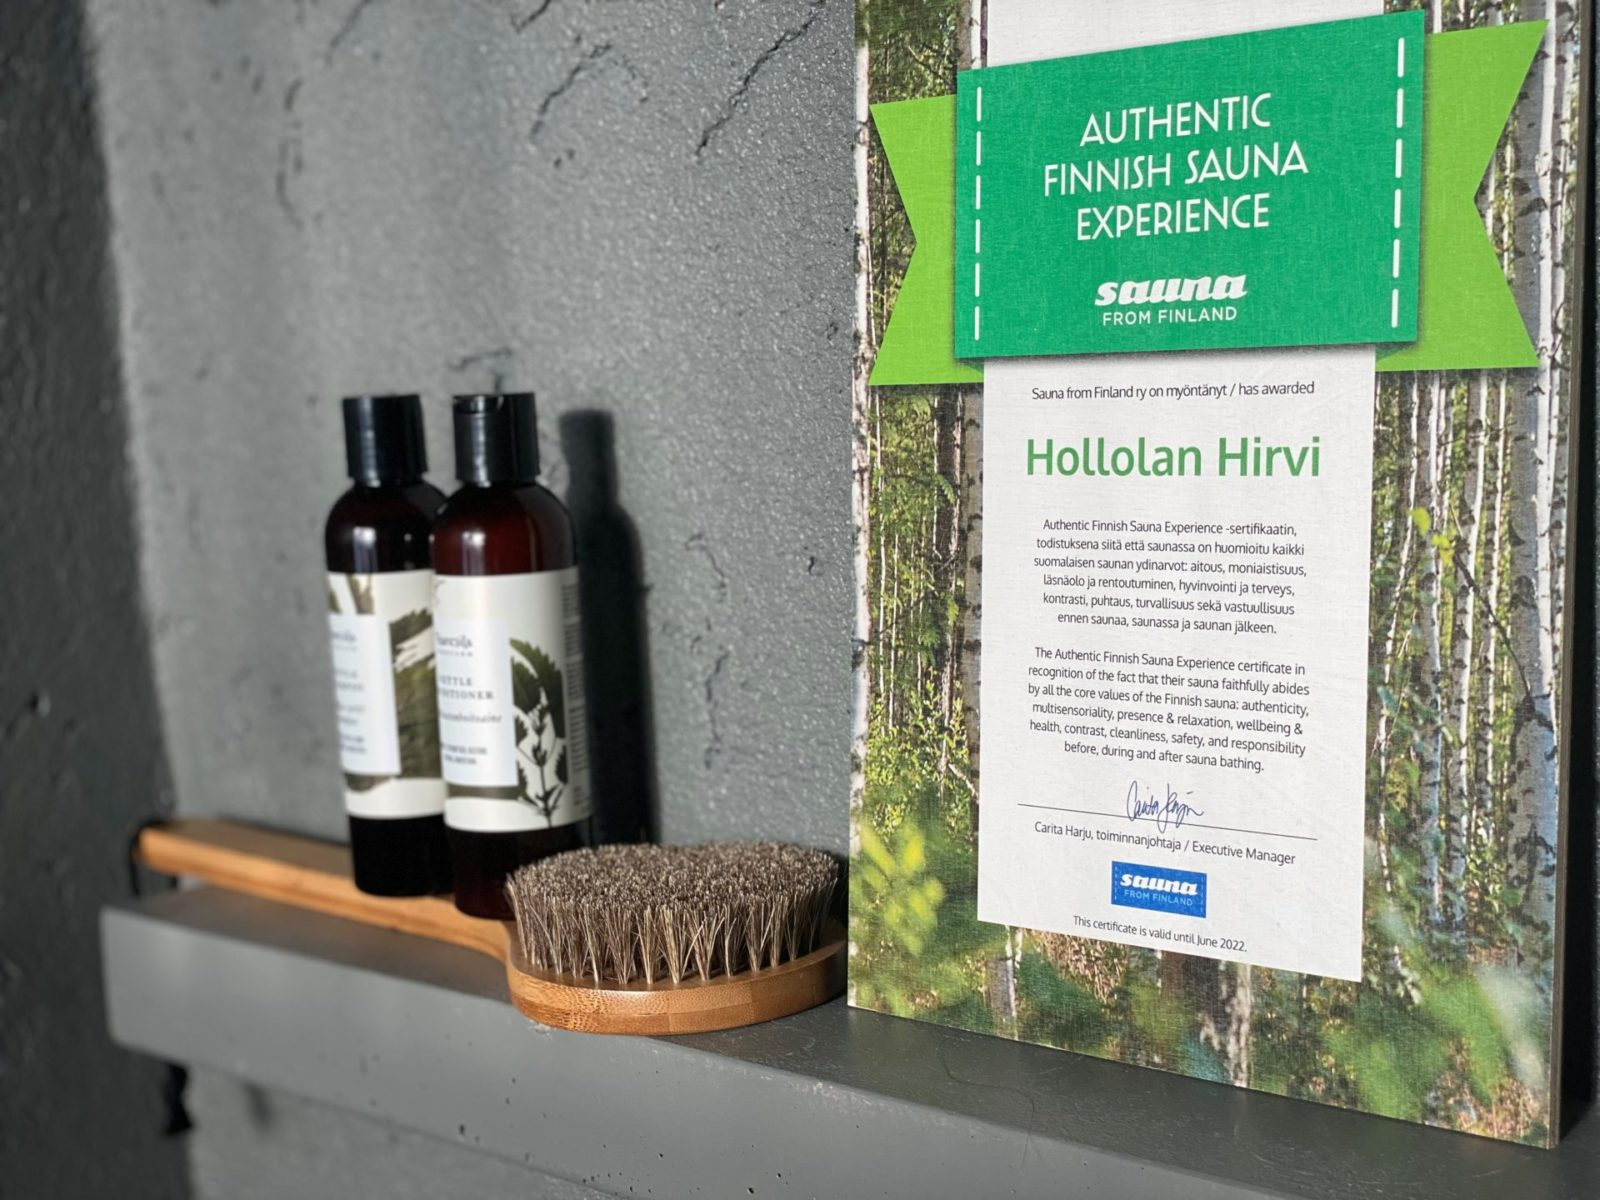 Finnish Sauna Quality Certficate